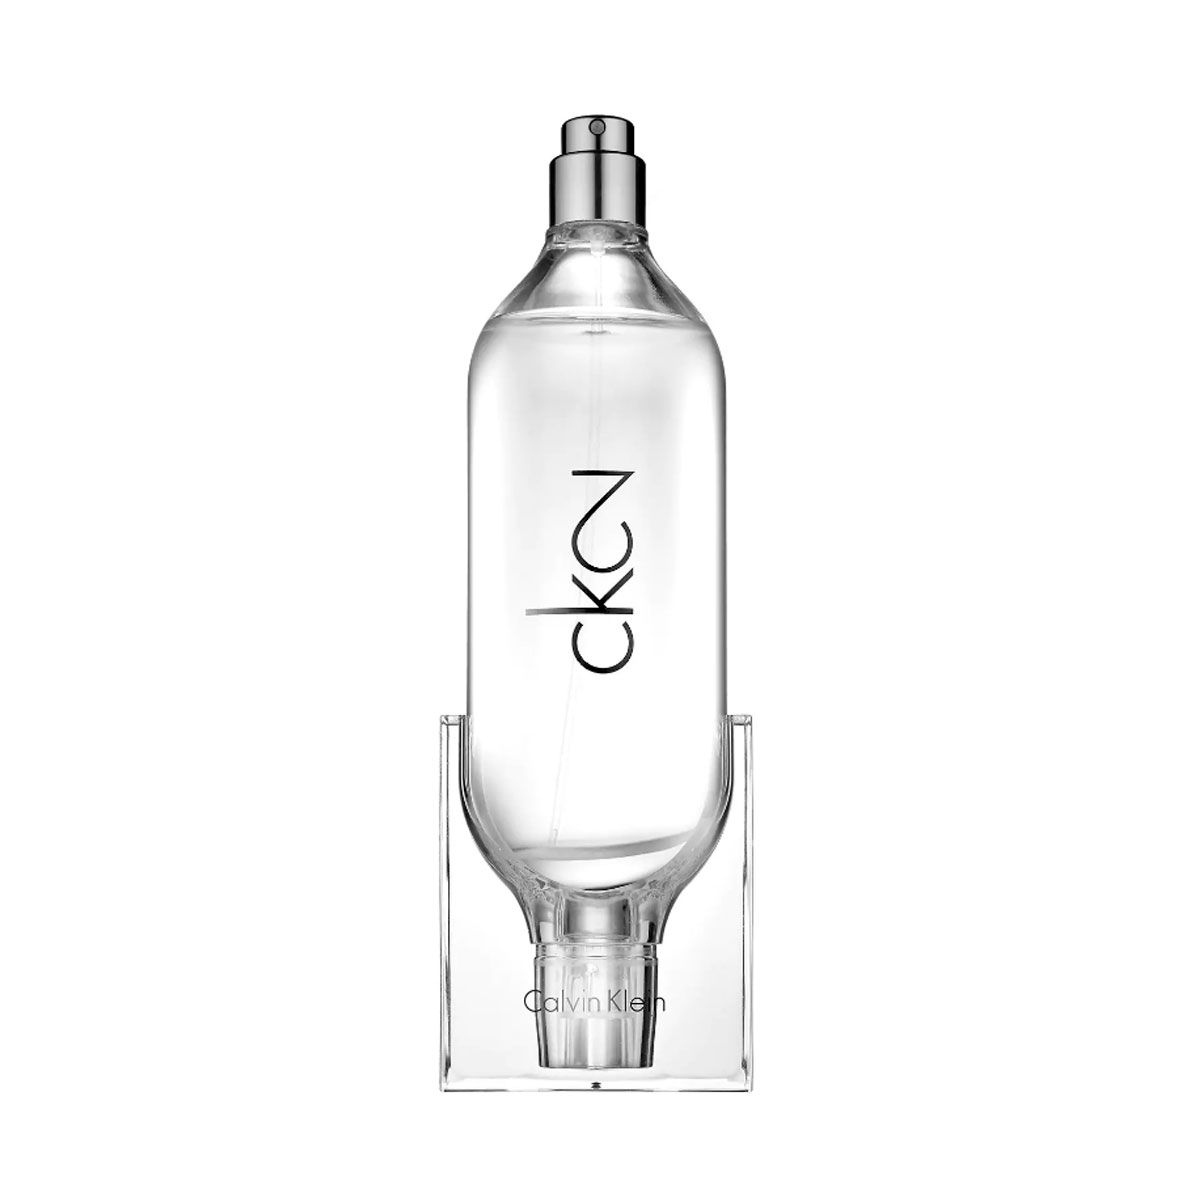 7bfa1f32d5 Perfume Calvin Klein Ck2 Unissex Edt 50ml - Boutique dos Perfumes ...